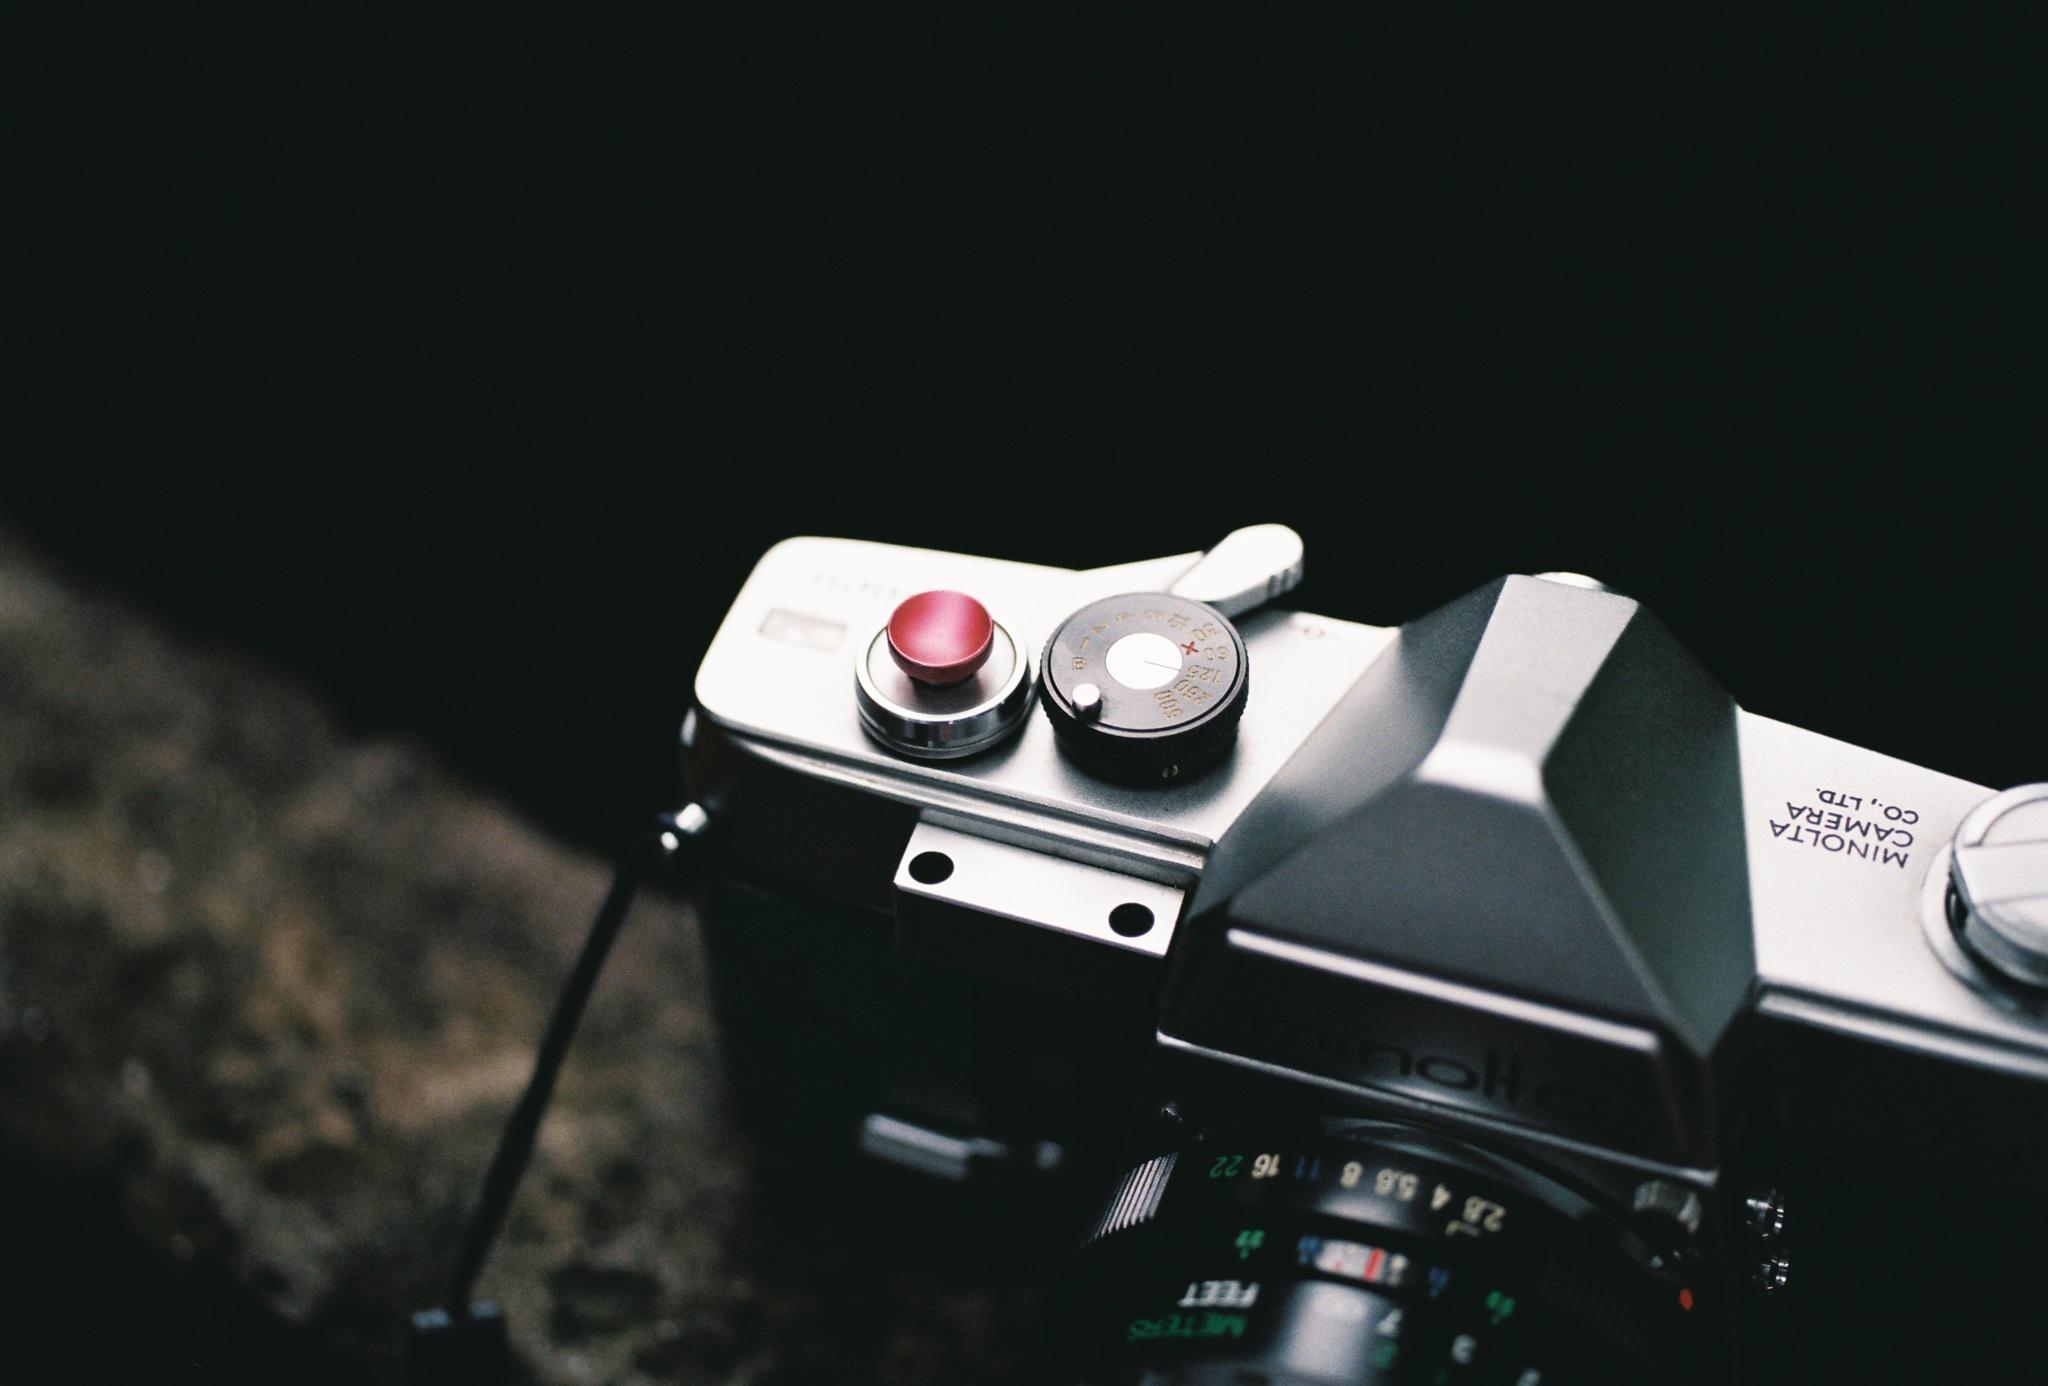 Minolta Sweet + Minolta Macro 50f2.8 + Fuji C200 by Hieu Pham Trong